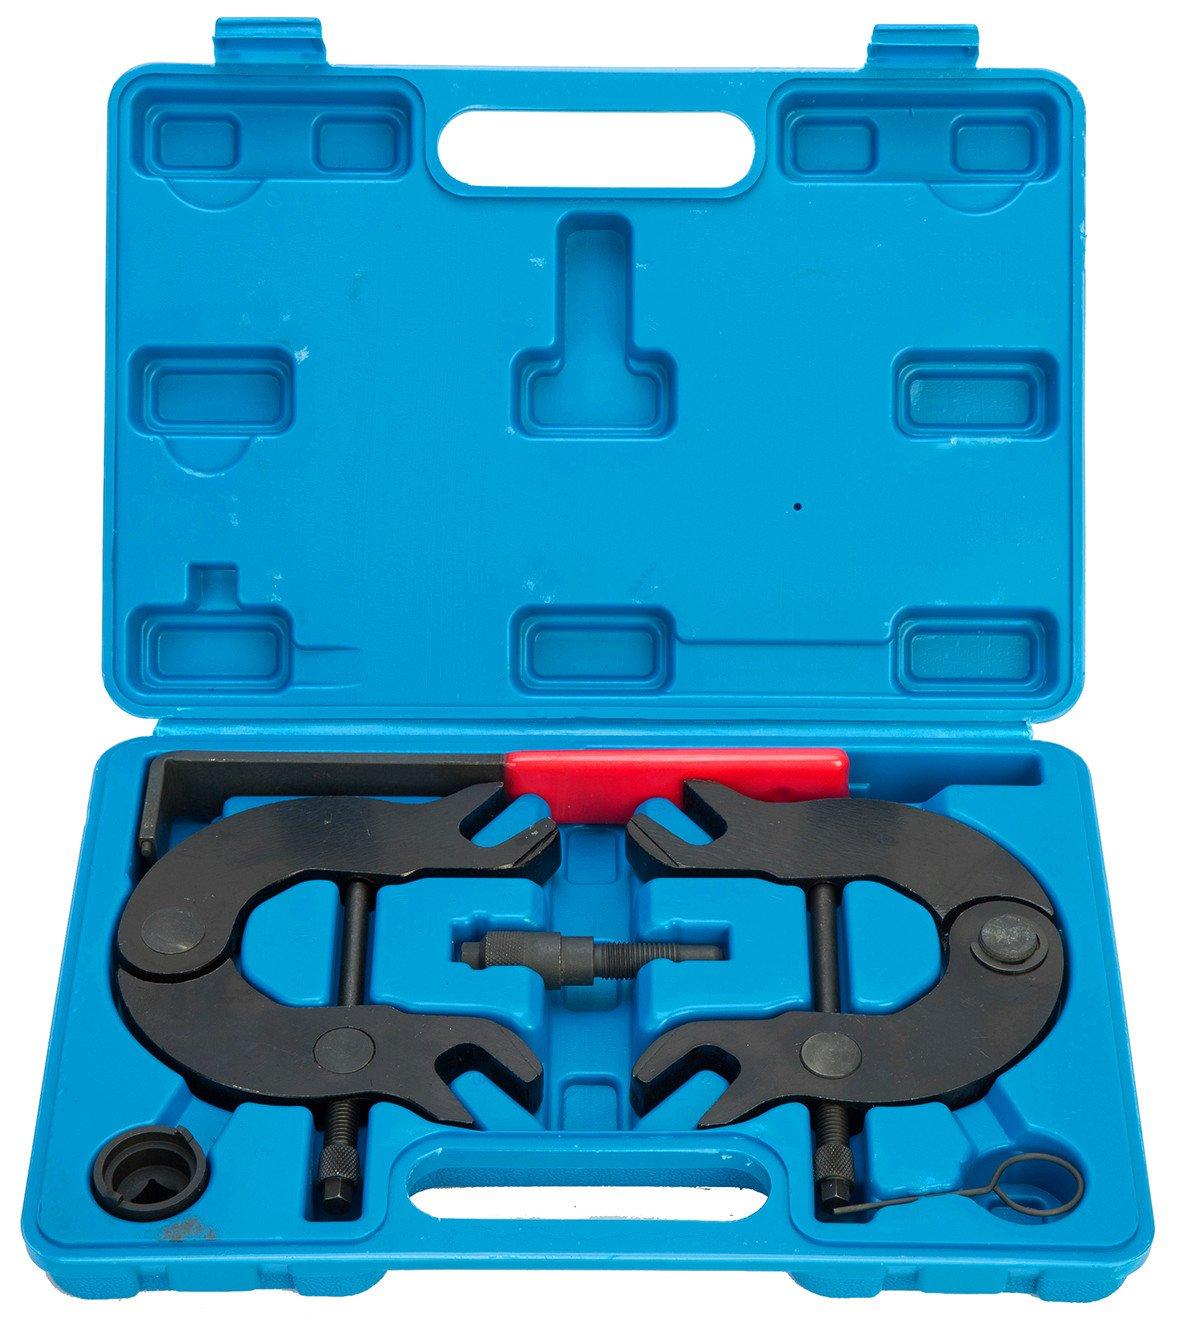 8MILELAKE Camshaft Alignment Engine Cam Timing Tool Kit Compatible for Audi A4 A6 V6 3.0L